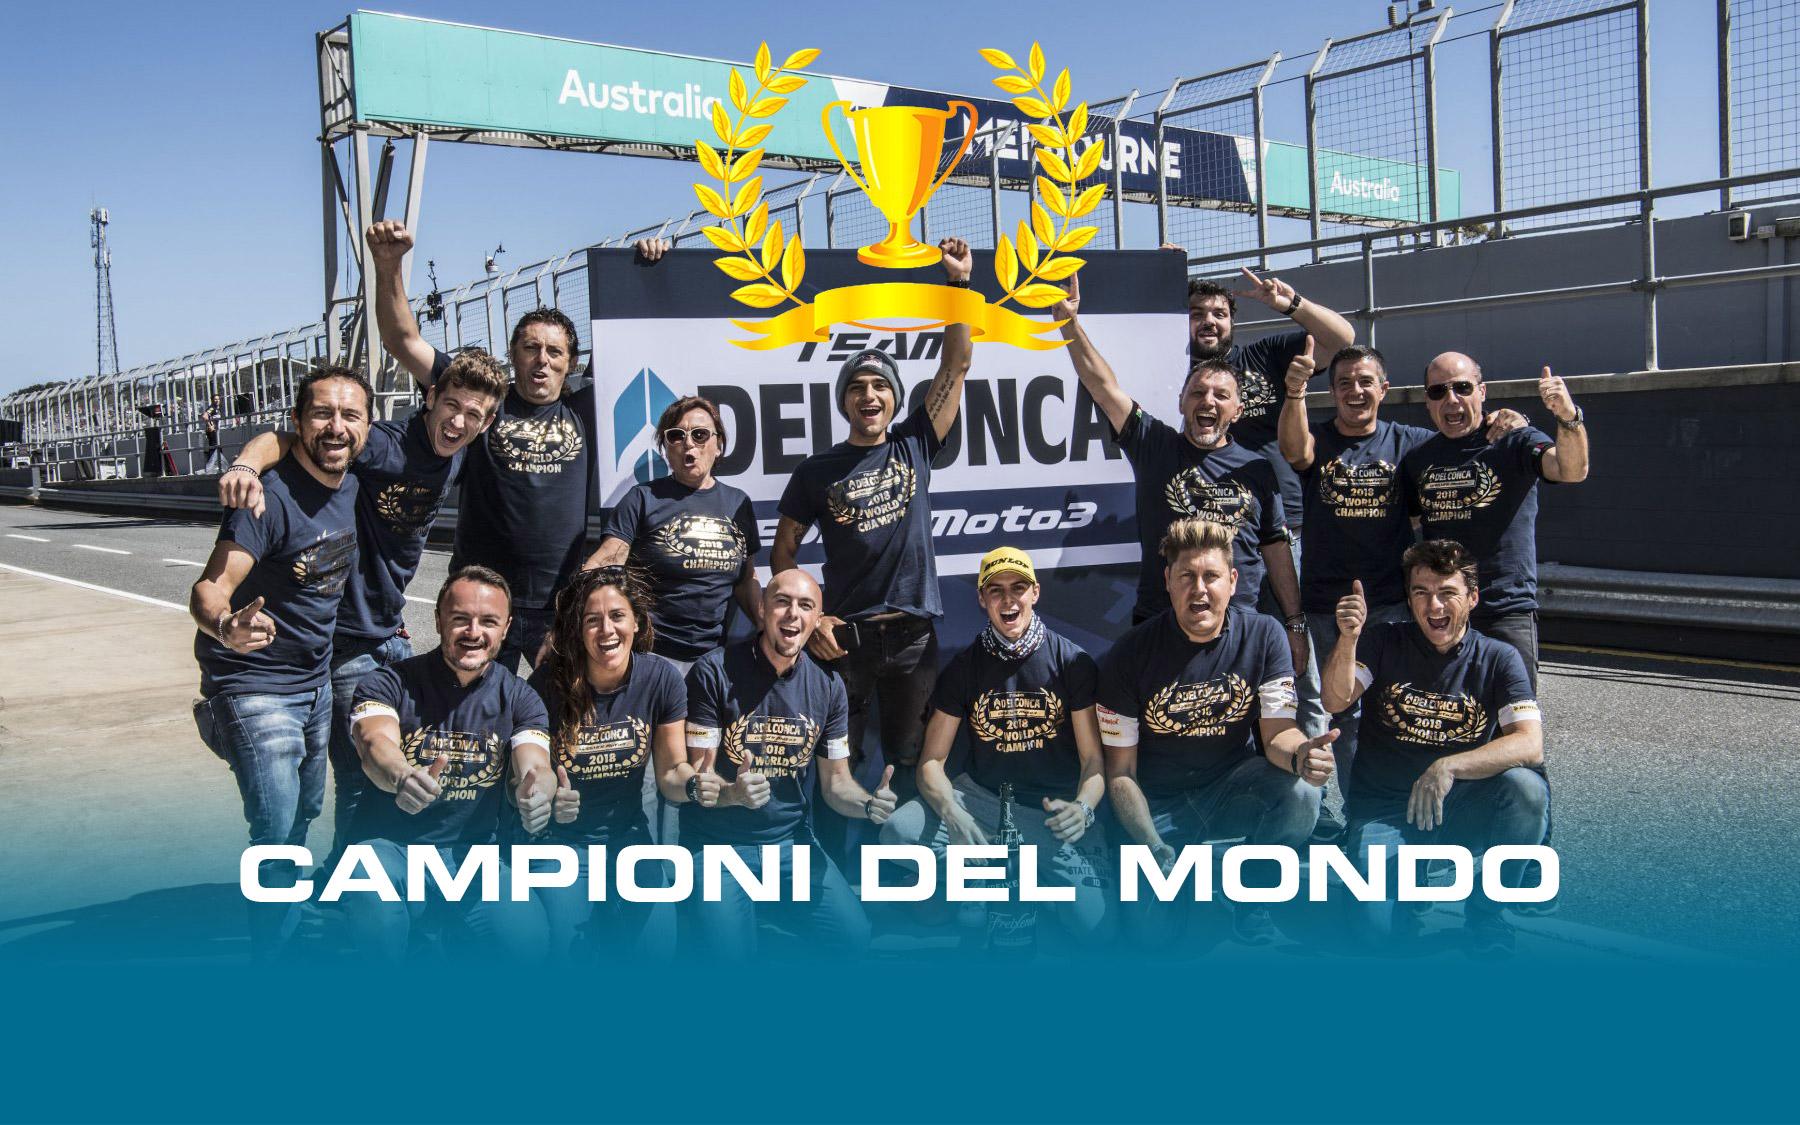 Team Gresini Moto3 Campione del mondo 2018   FD Group Ingegneria e design  industriale